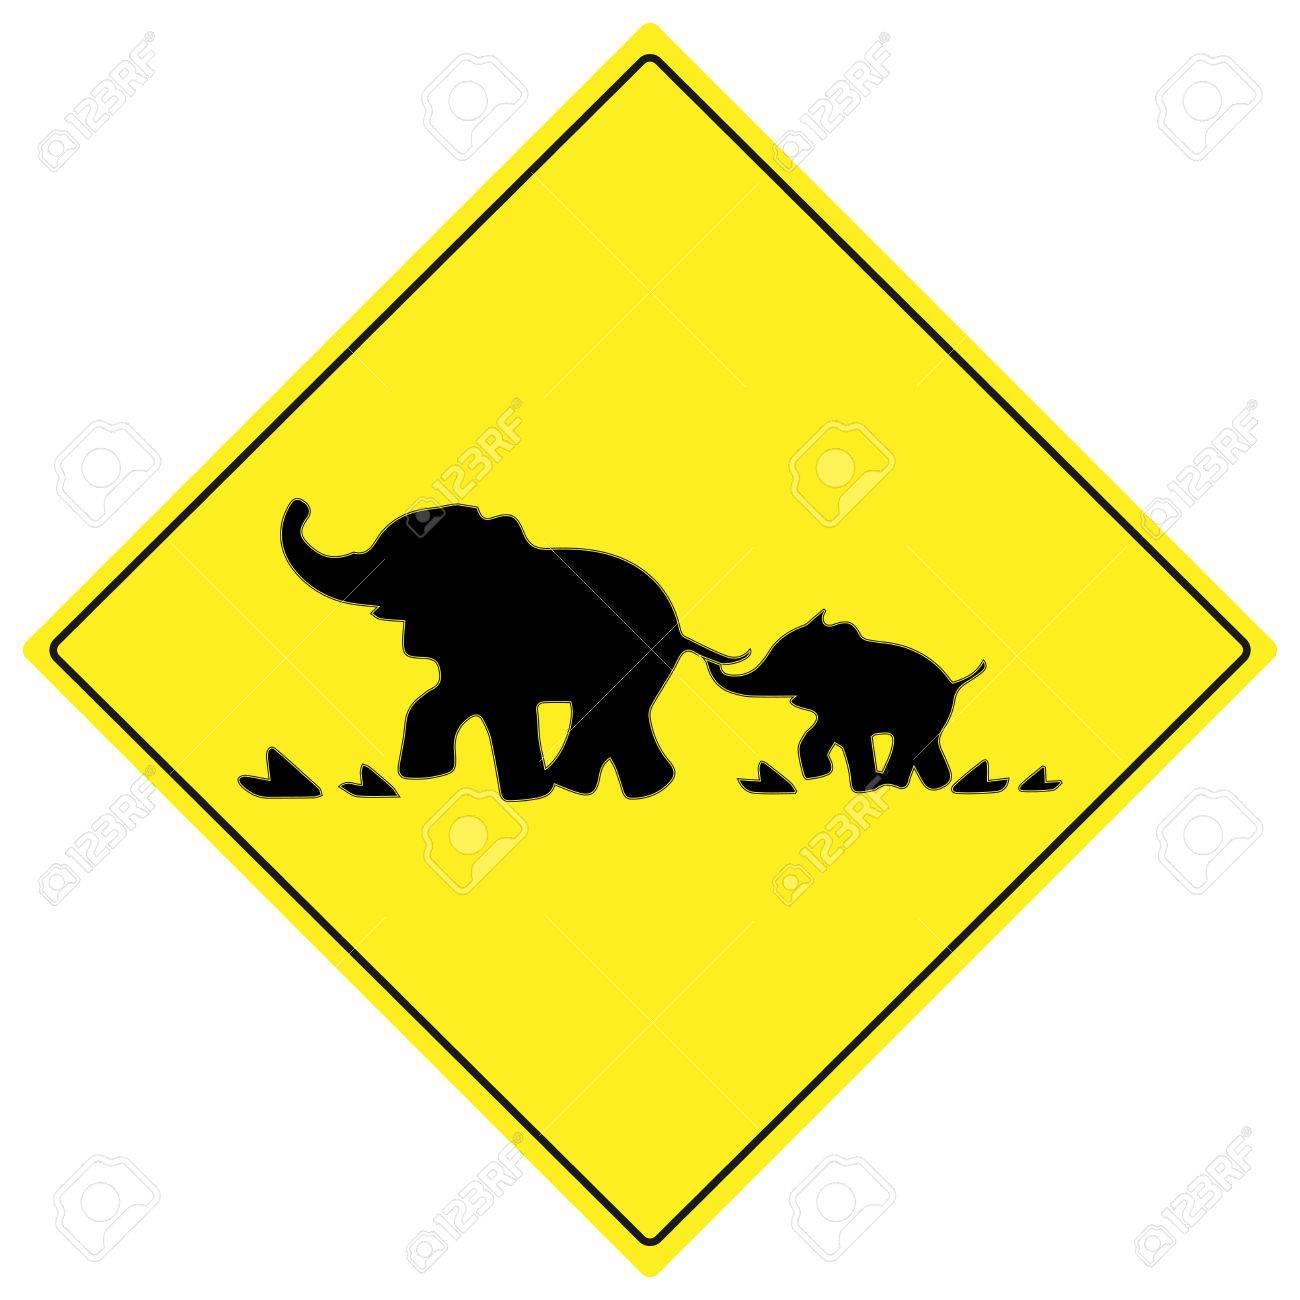 1300x1300 Beware Elephant Traffic Sign. Elephant Warning Traffic Sign